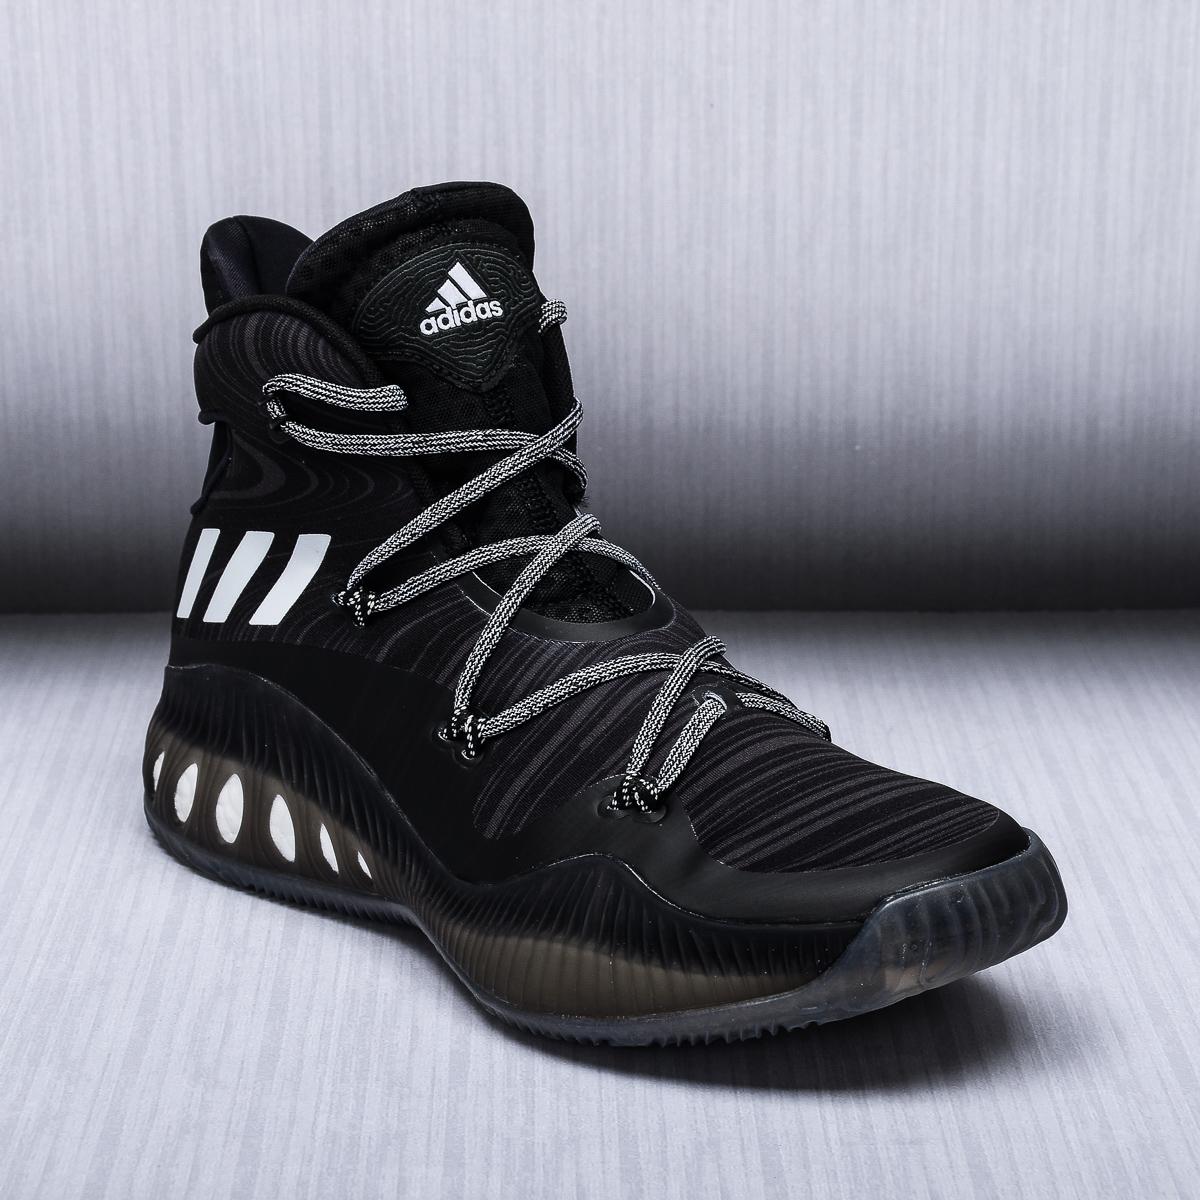 Adidas pazzo esplosivo basket scarpe adidas scarpe da basket